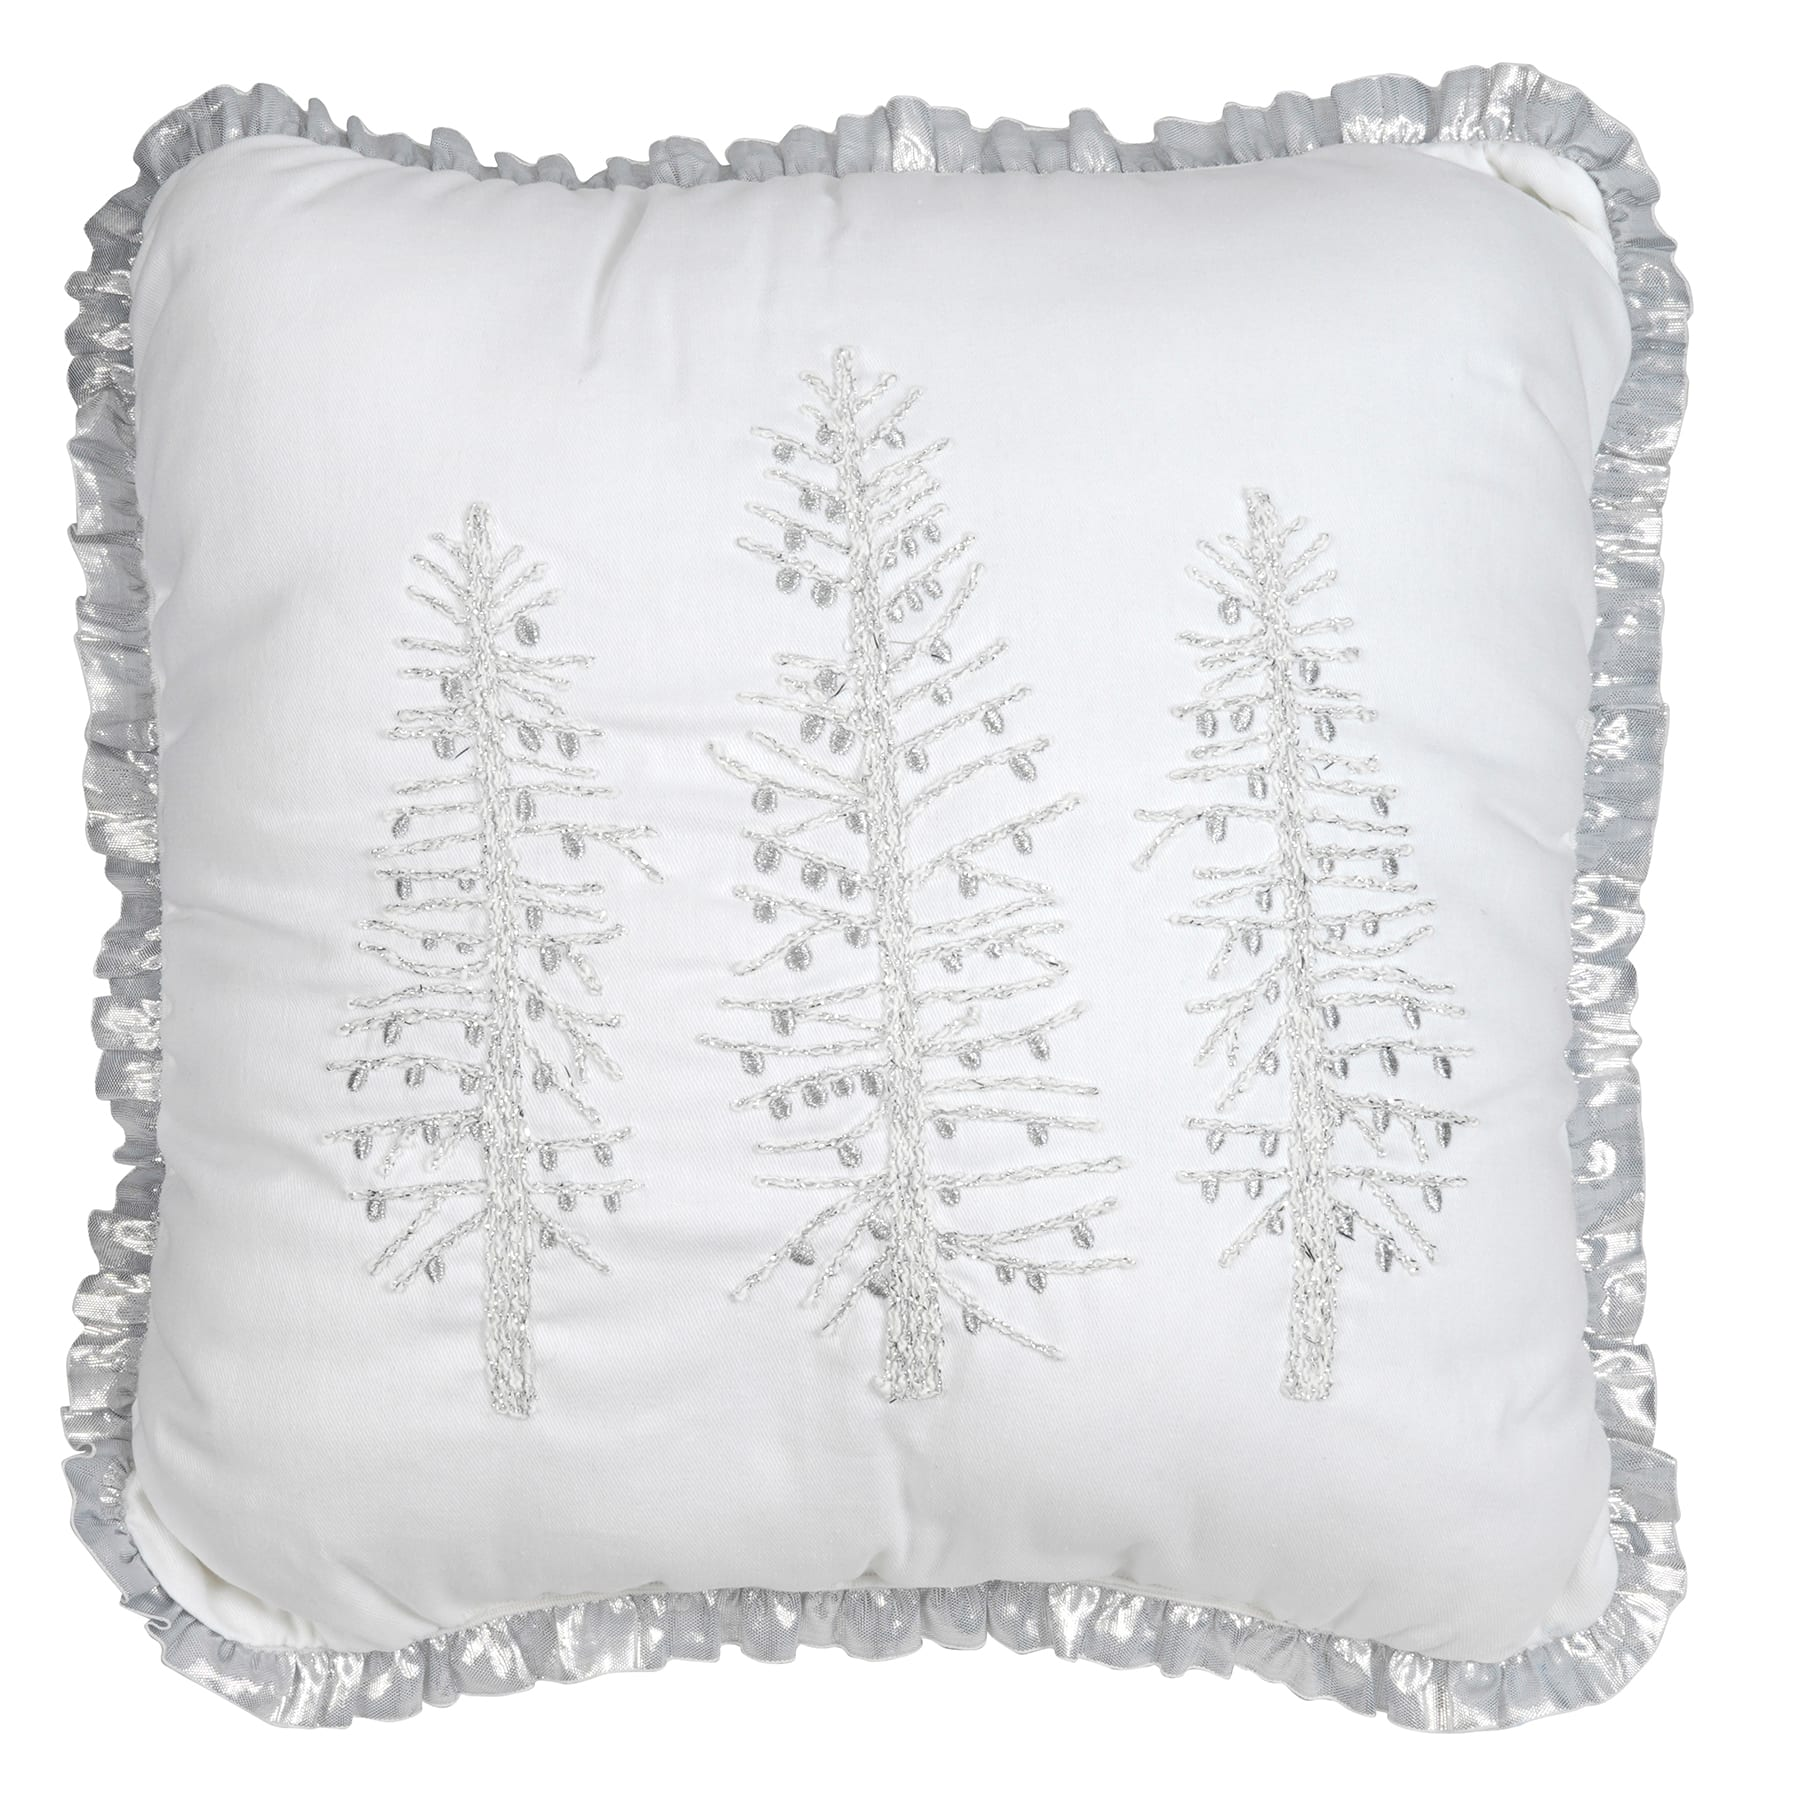 AshlandChristmas Trees Lumbar Pillow By